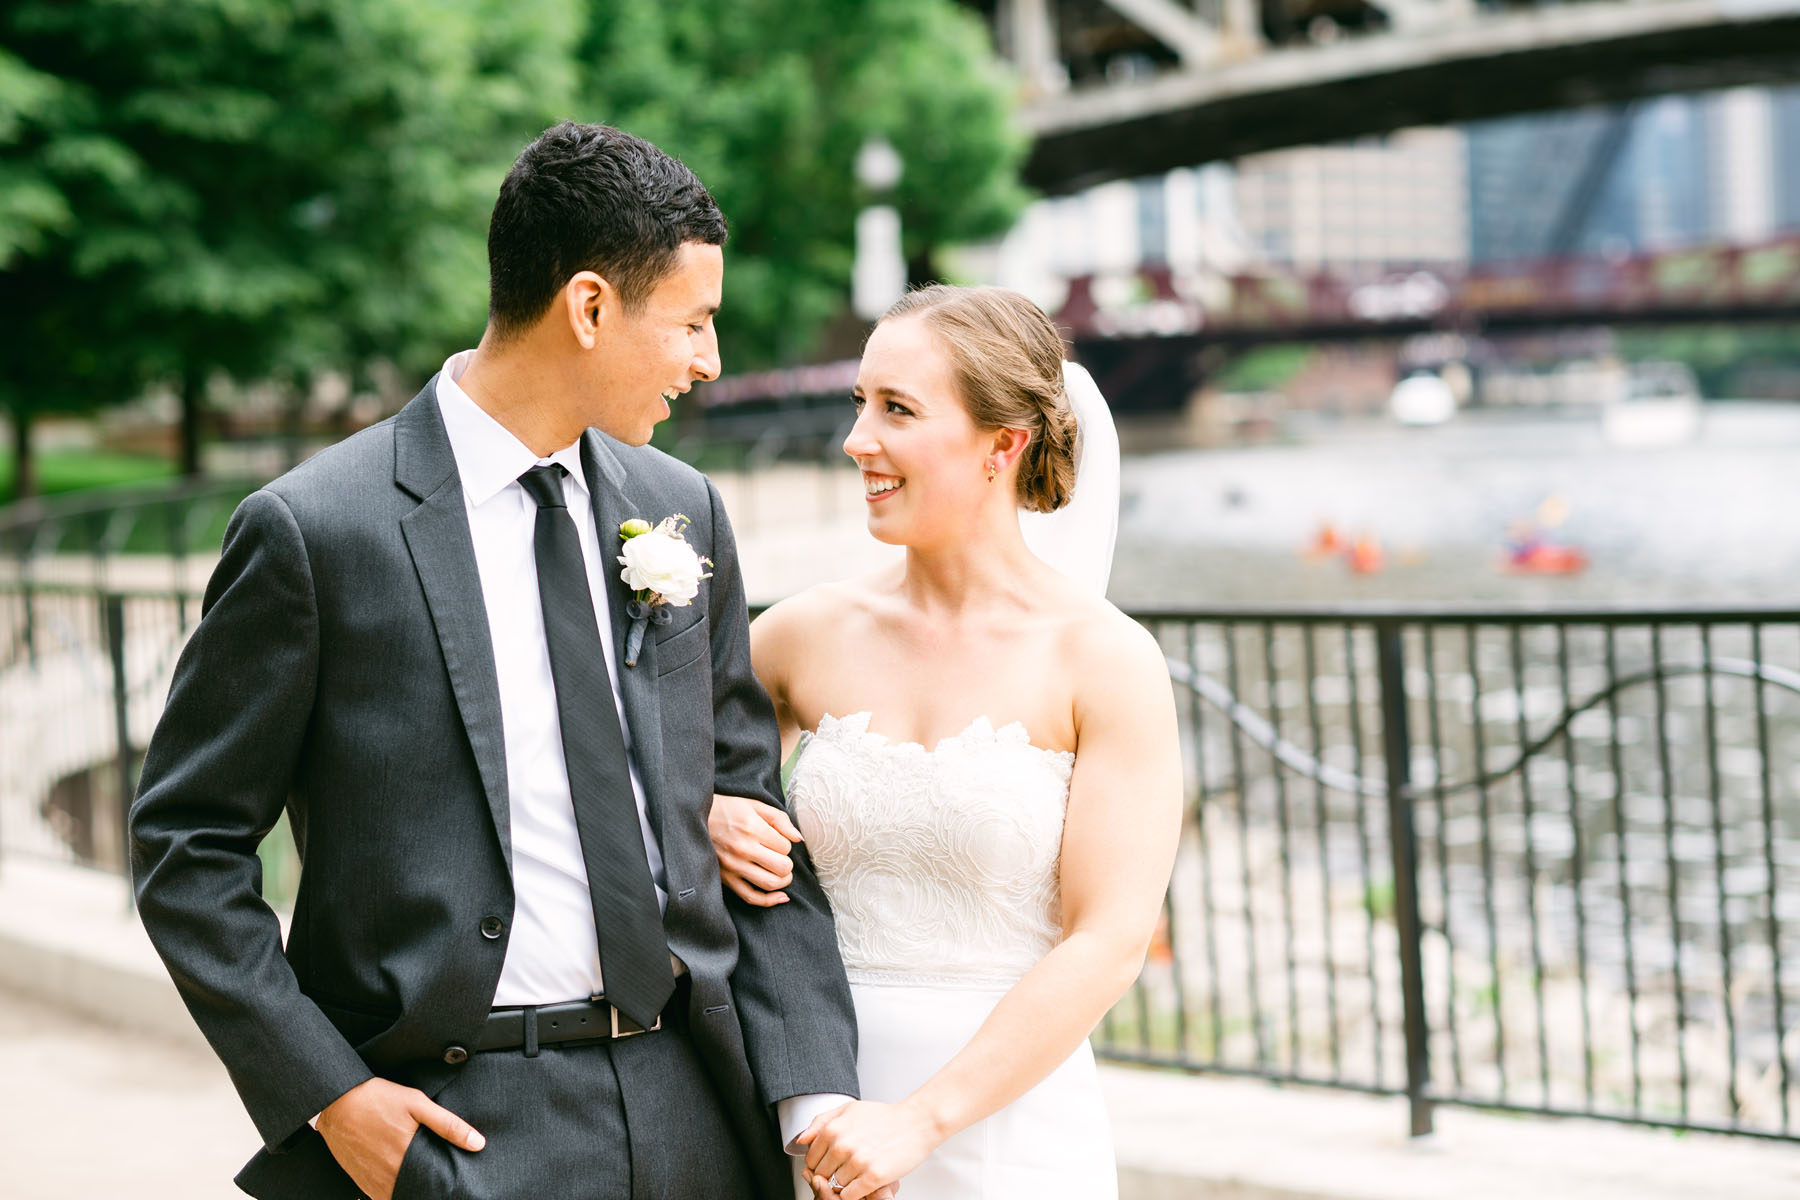 Montgomery Ward Park Wedding